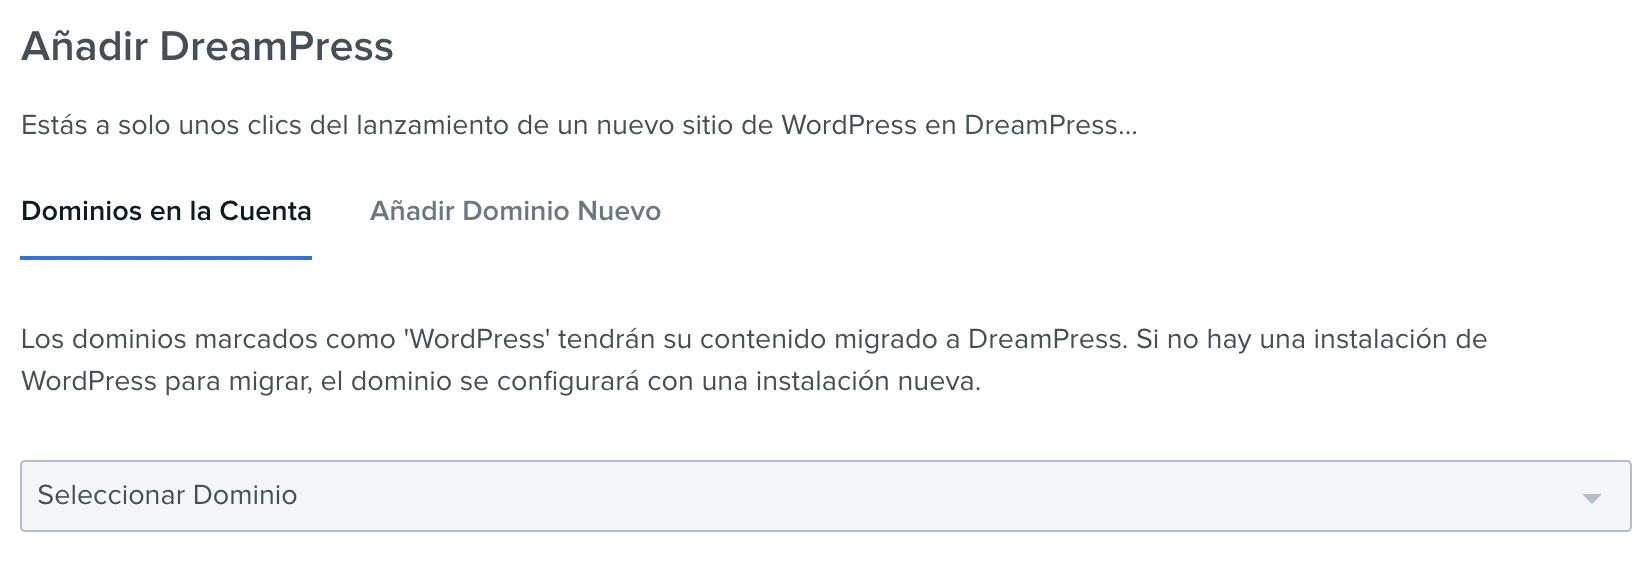 es-panel-add-dreampress-02.png